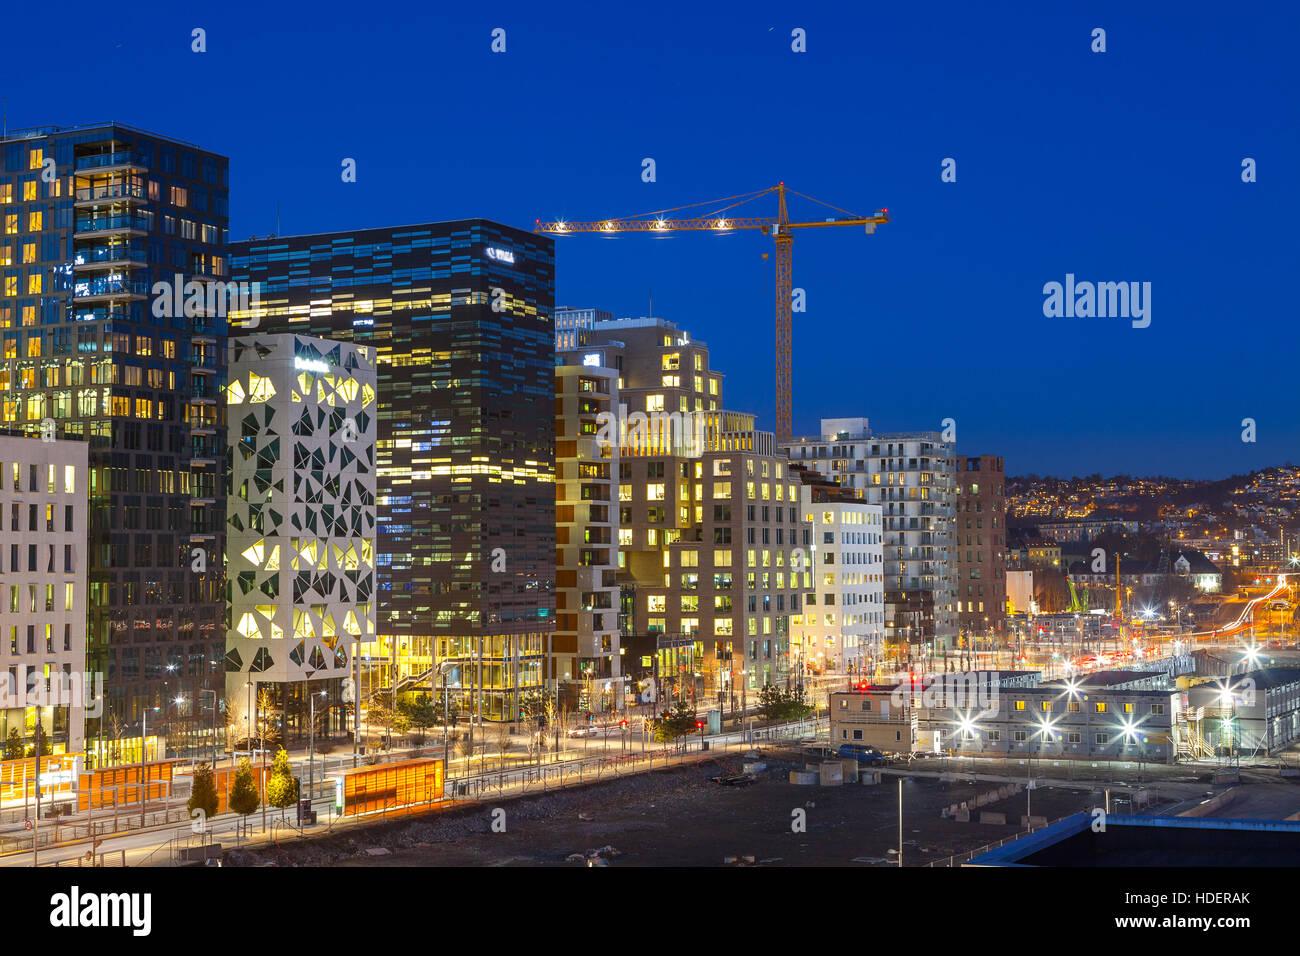 Bjorvika business quarter (Barcose). Night cityscape. - Stock Image